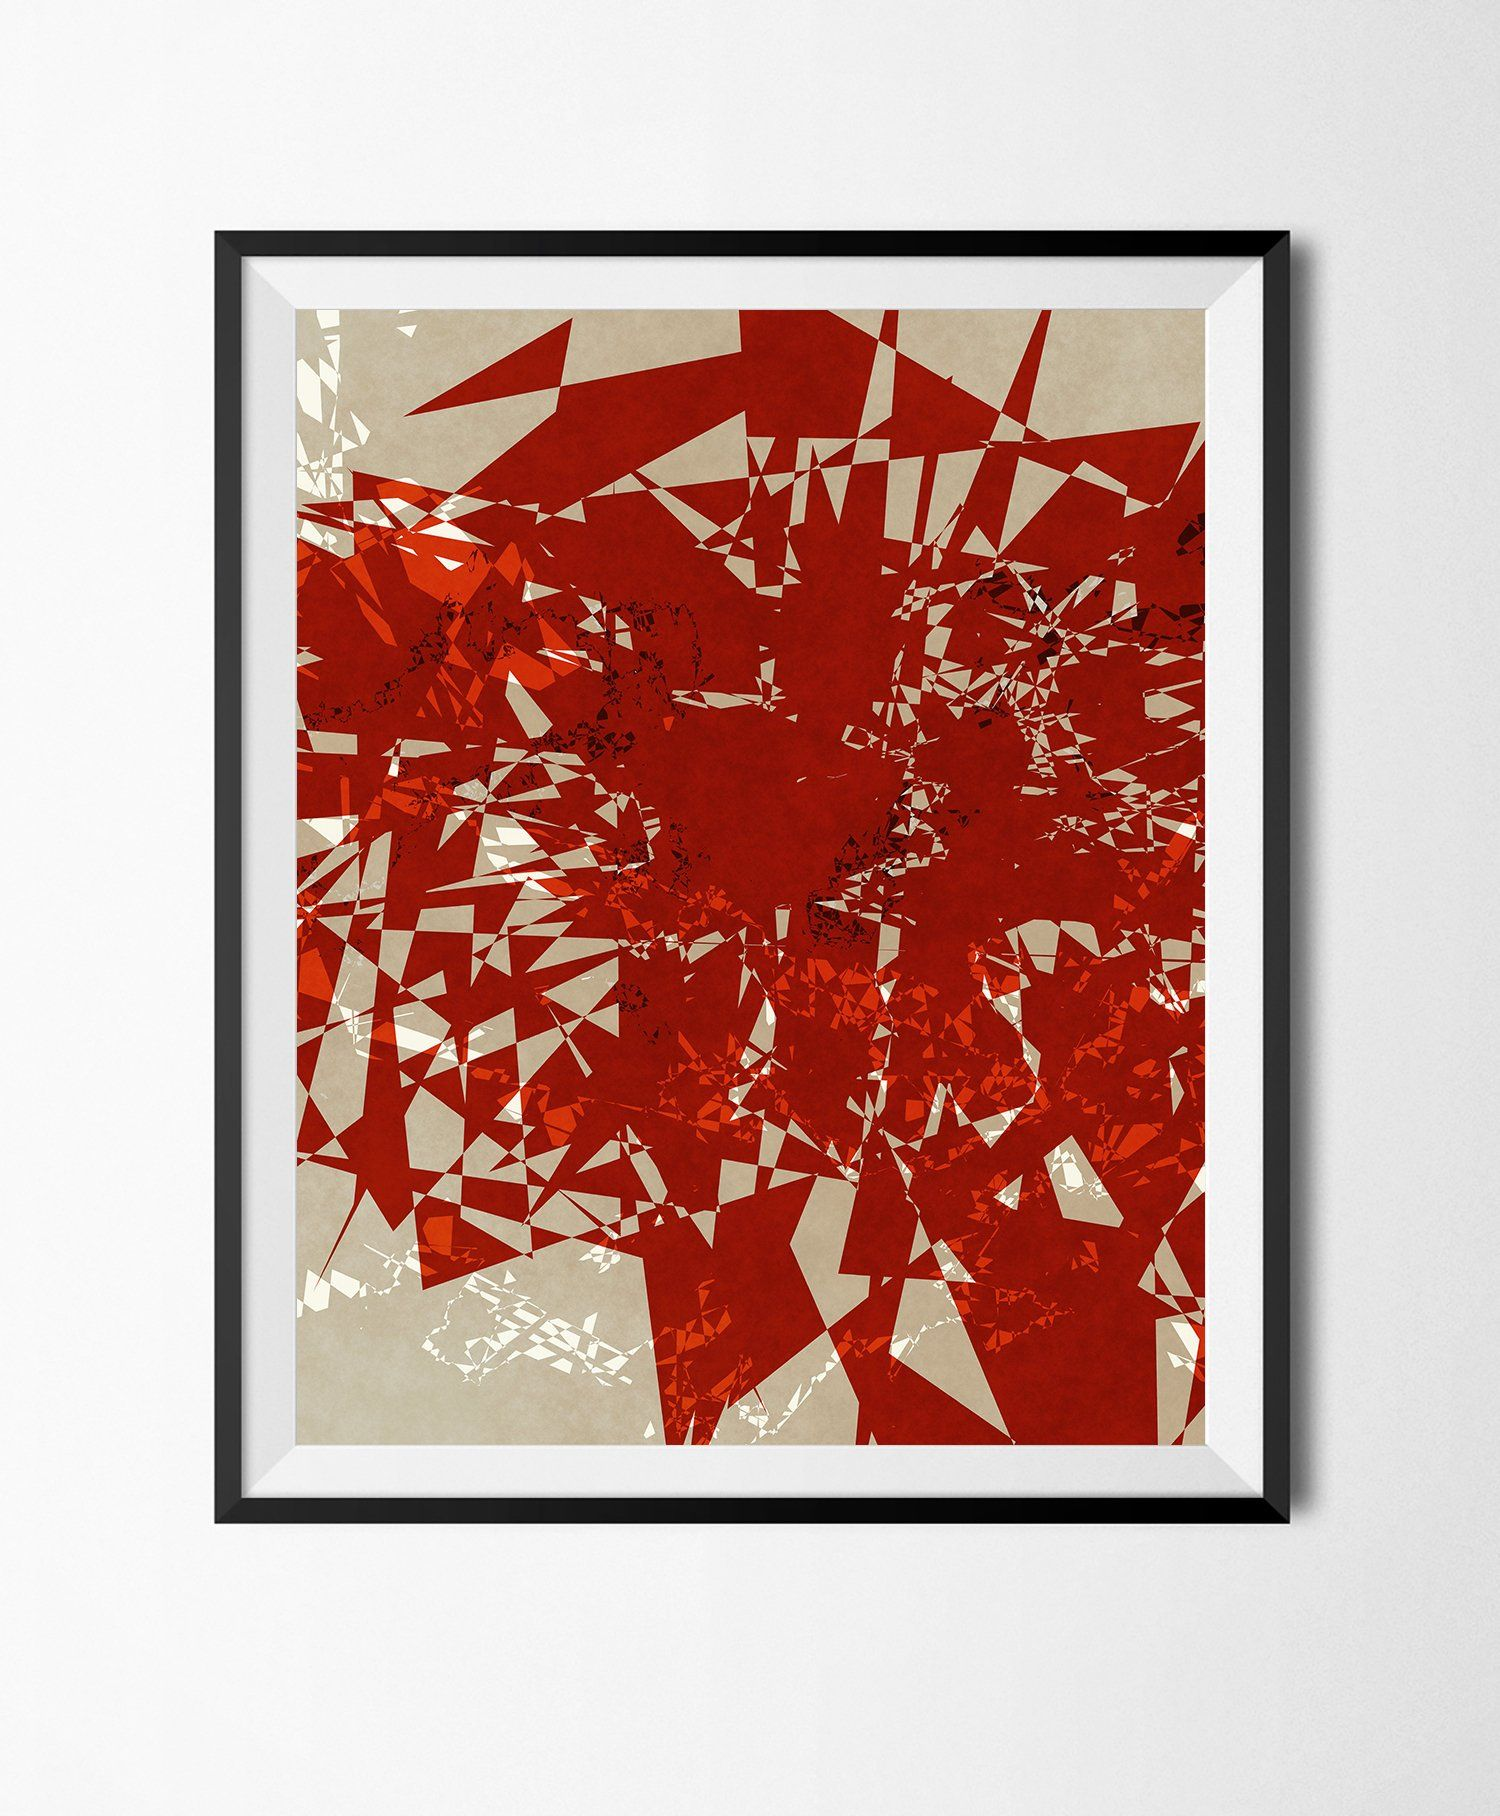 Download Printable Art,Grunge Wall Poster,Abstract Digital